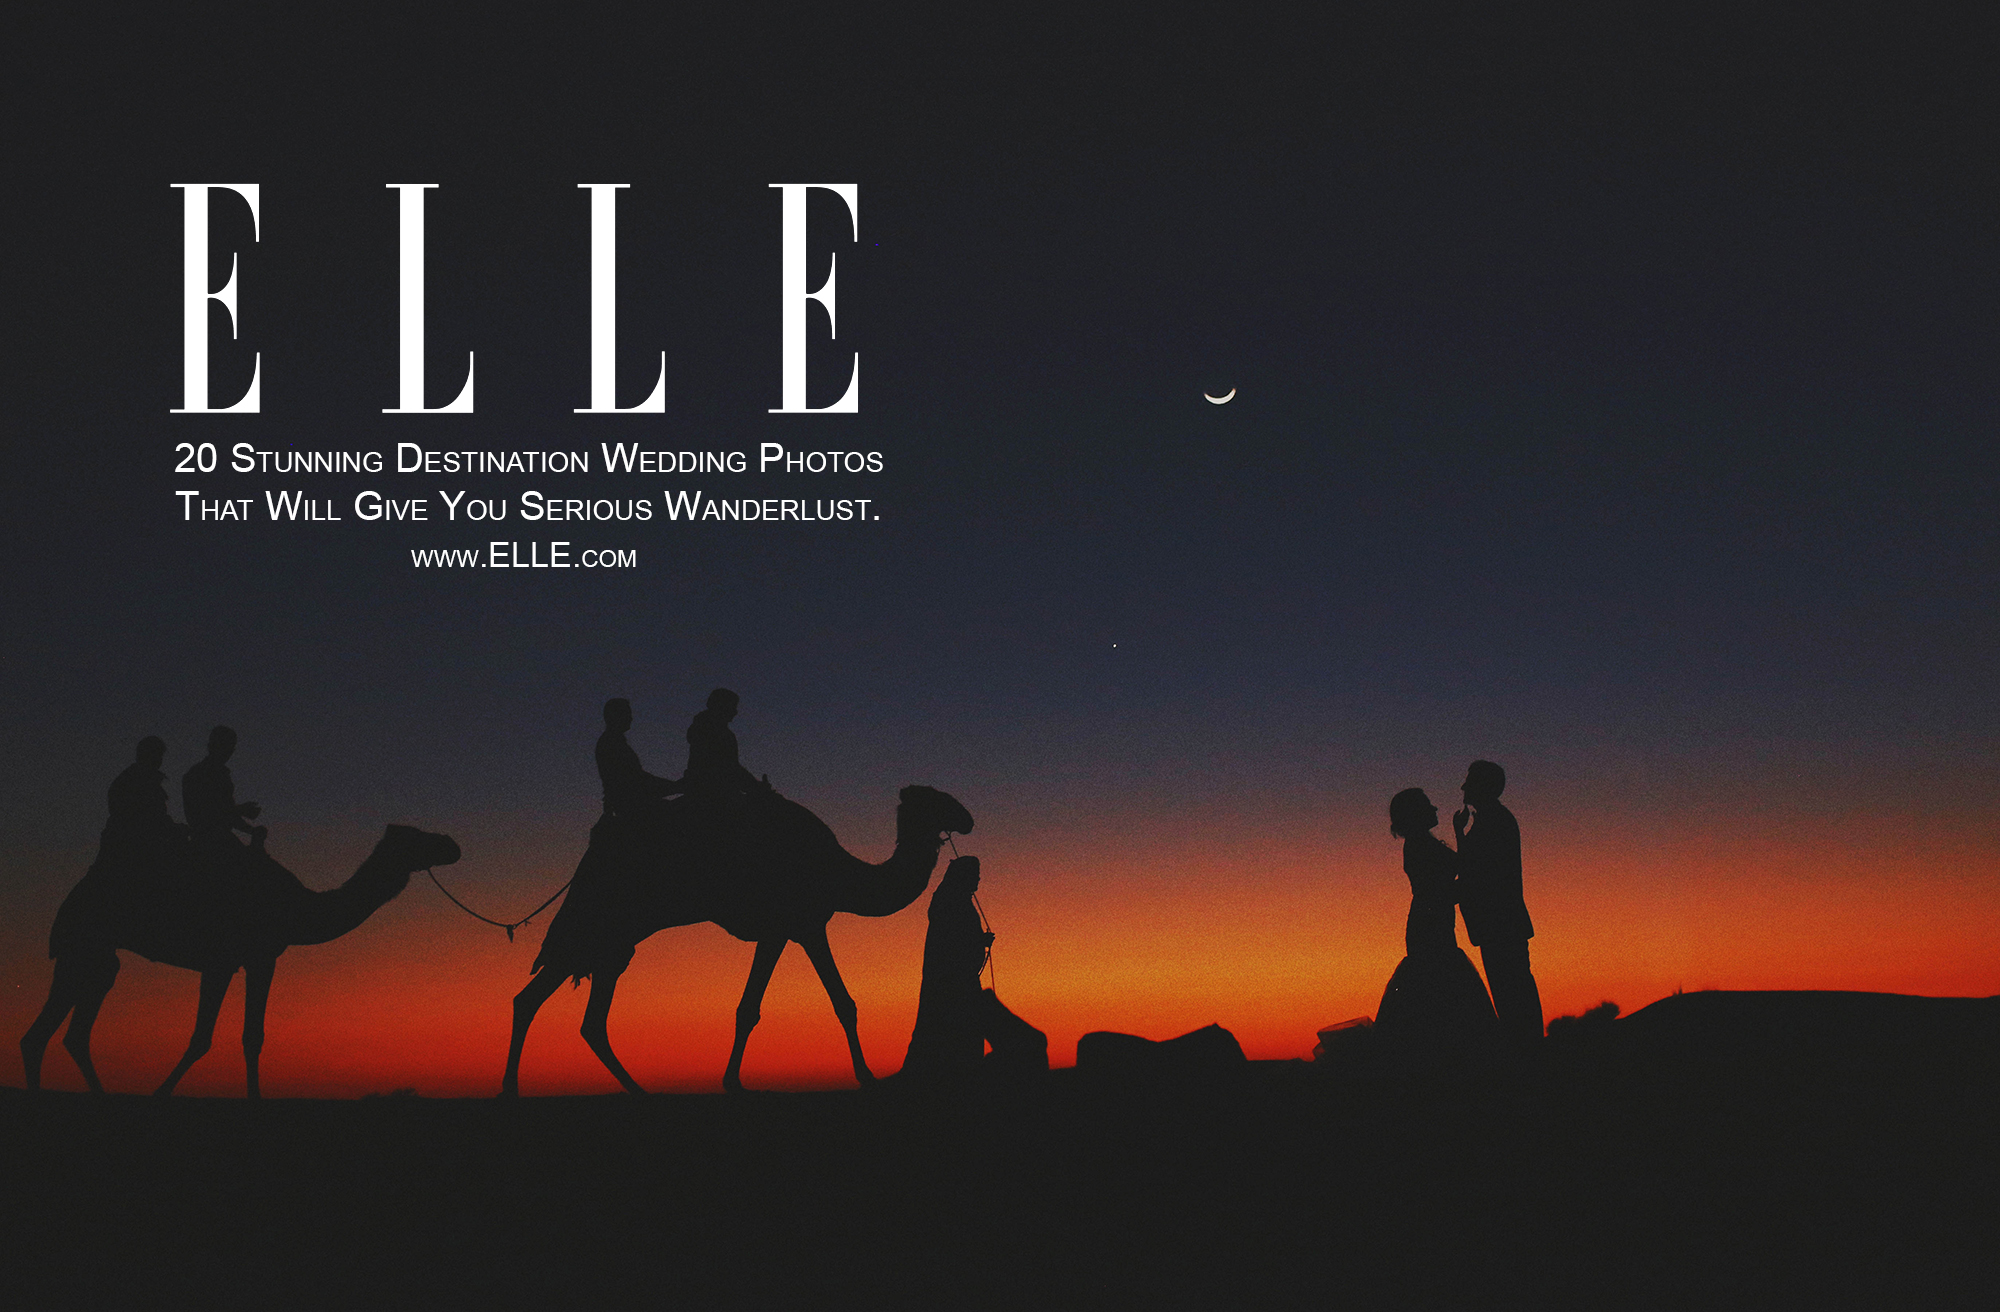 ELLE.com   20 Stunning Destination Wedding Photos That Will Give You Serious Wanderlust